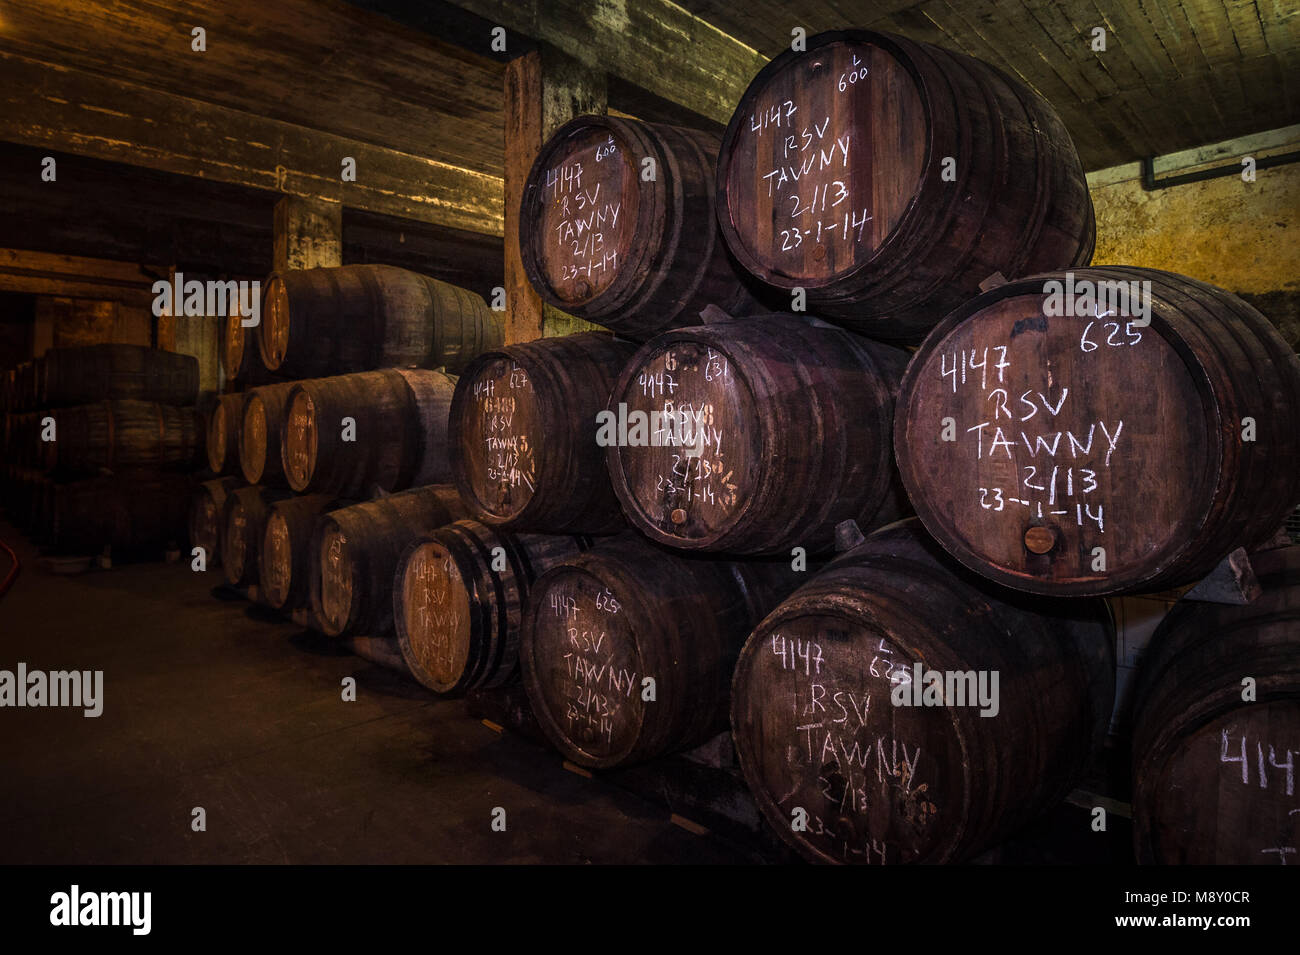 Port wine barrels in cellar, Vila Nova de Gaia, Porto, Portugal - Stock Image